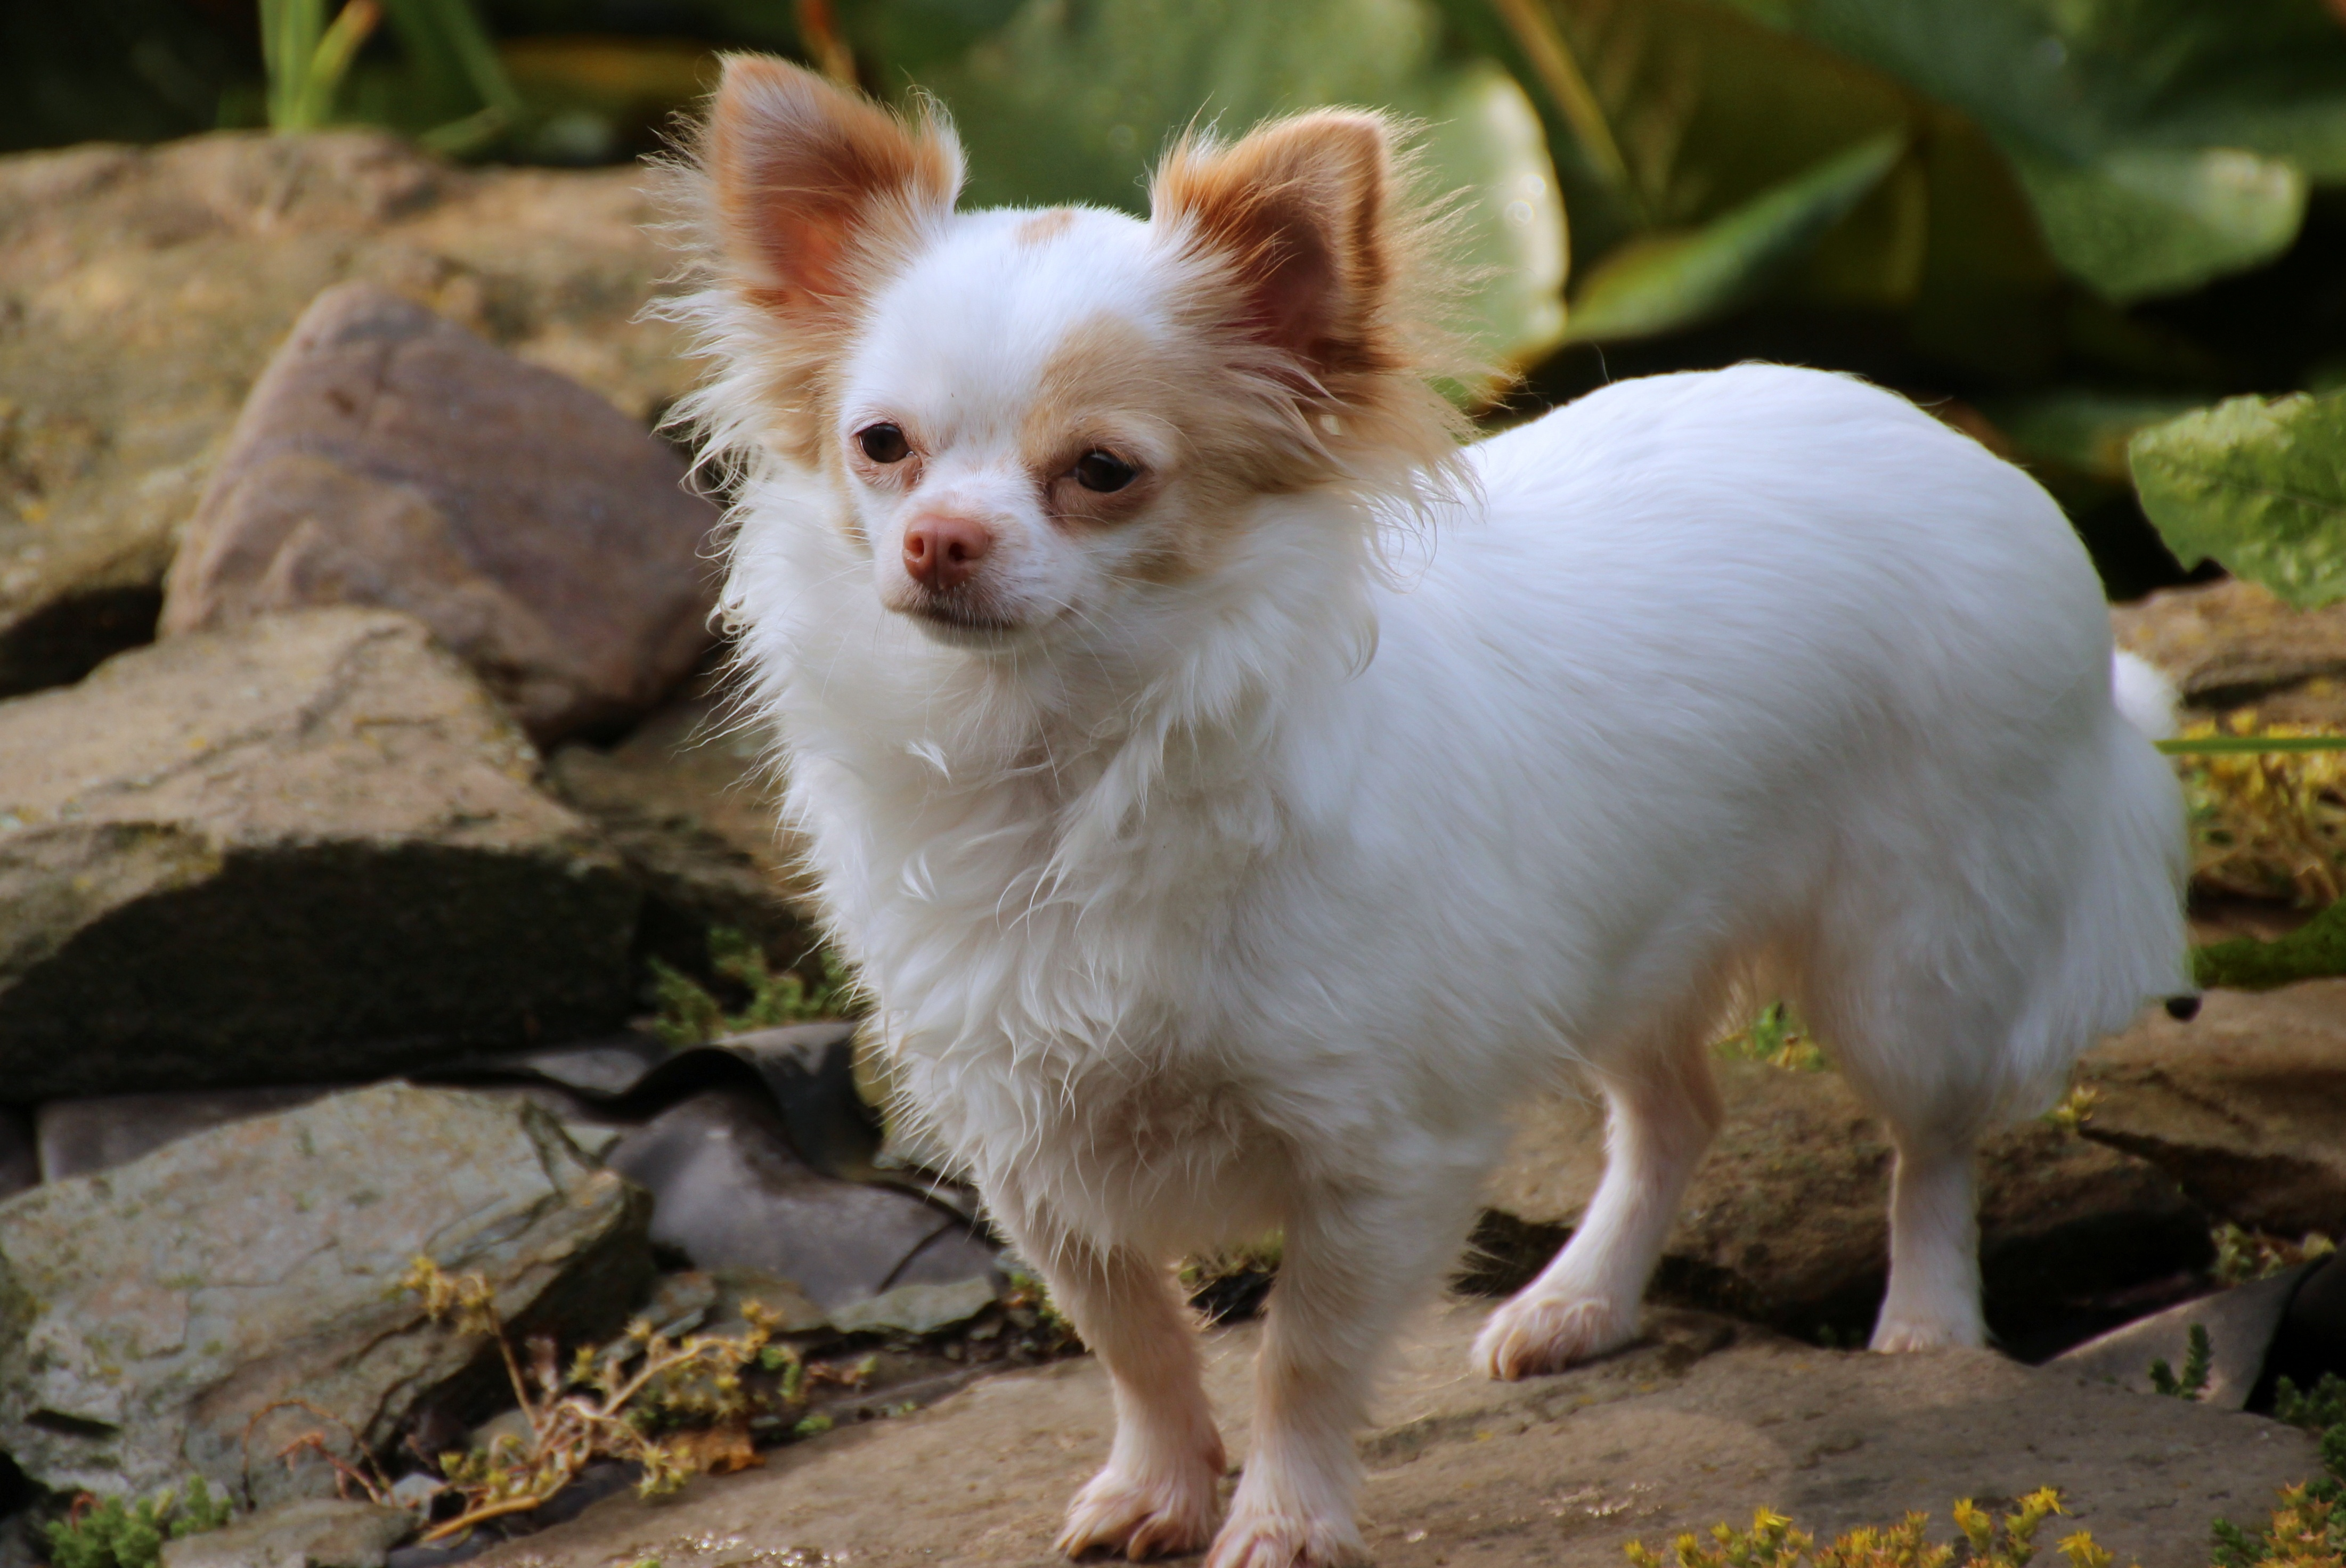 Cute Chihuahua, Animal, Chihuahua, Closeup, Dog, HQ Photo